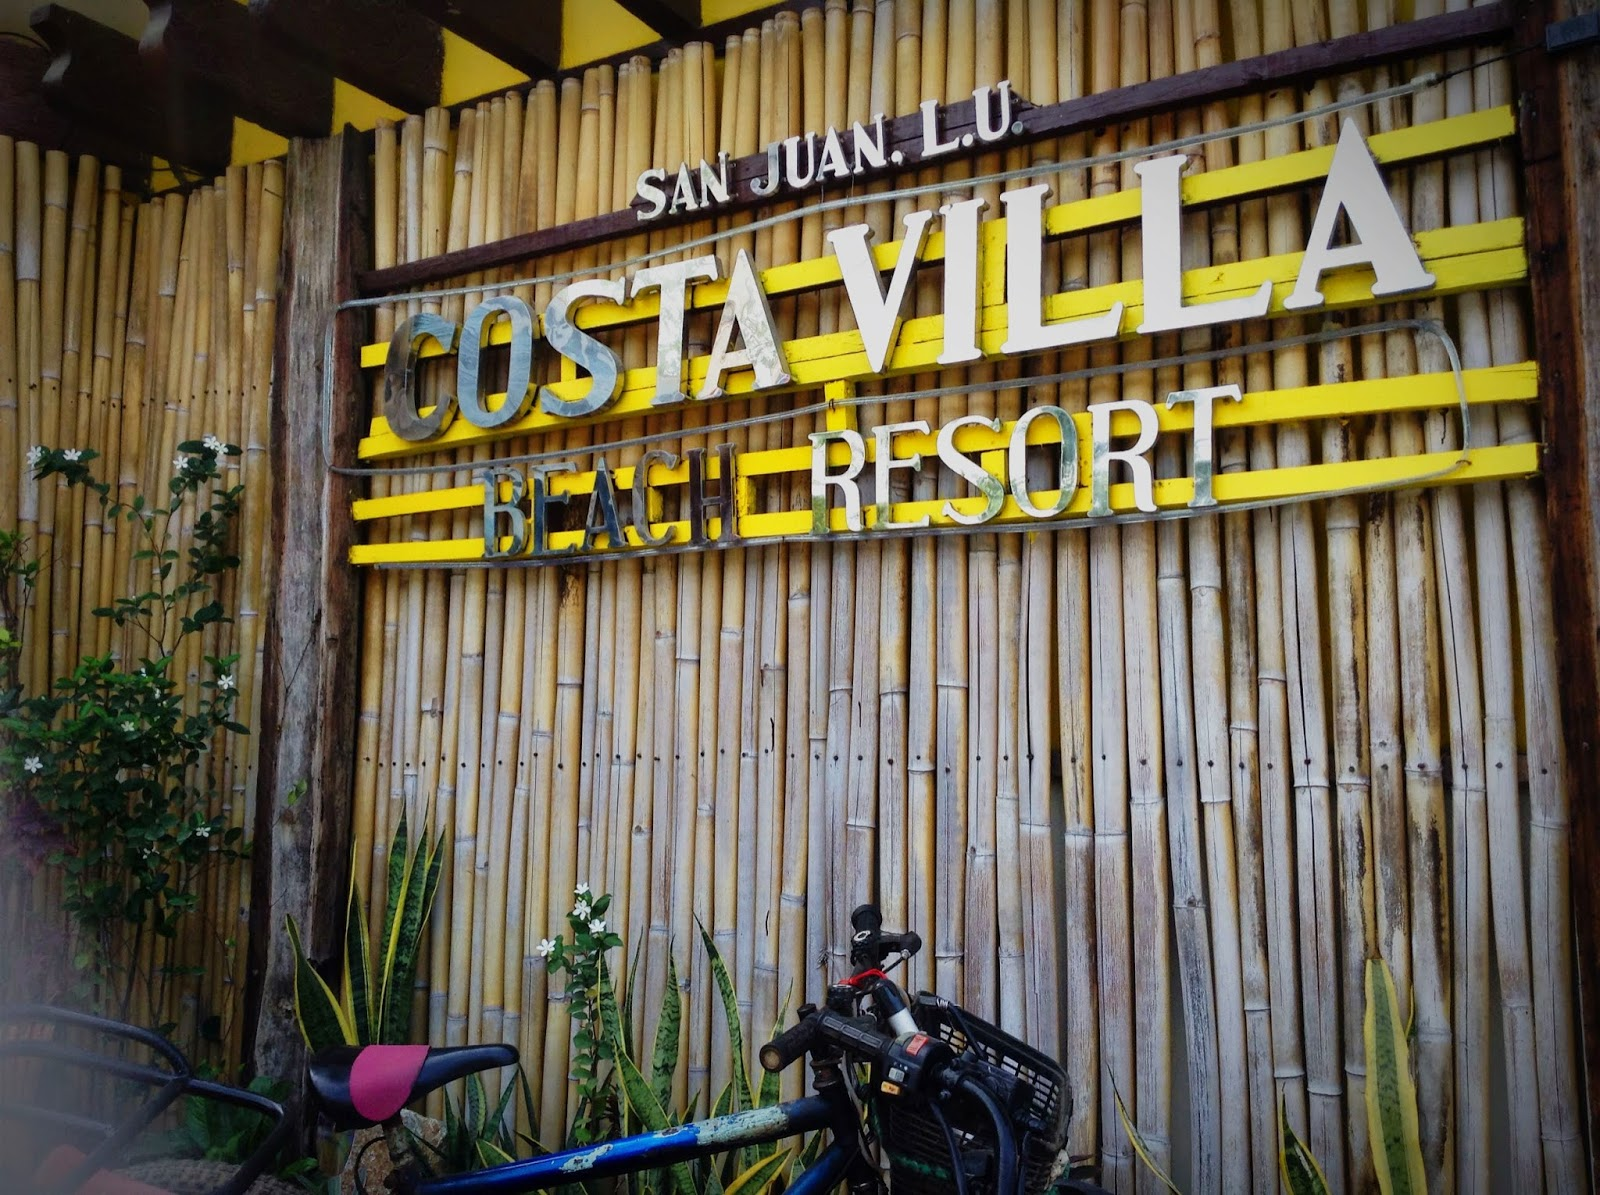 Costa Villa Beach Resort Family Fun And Surfing